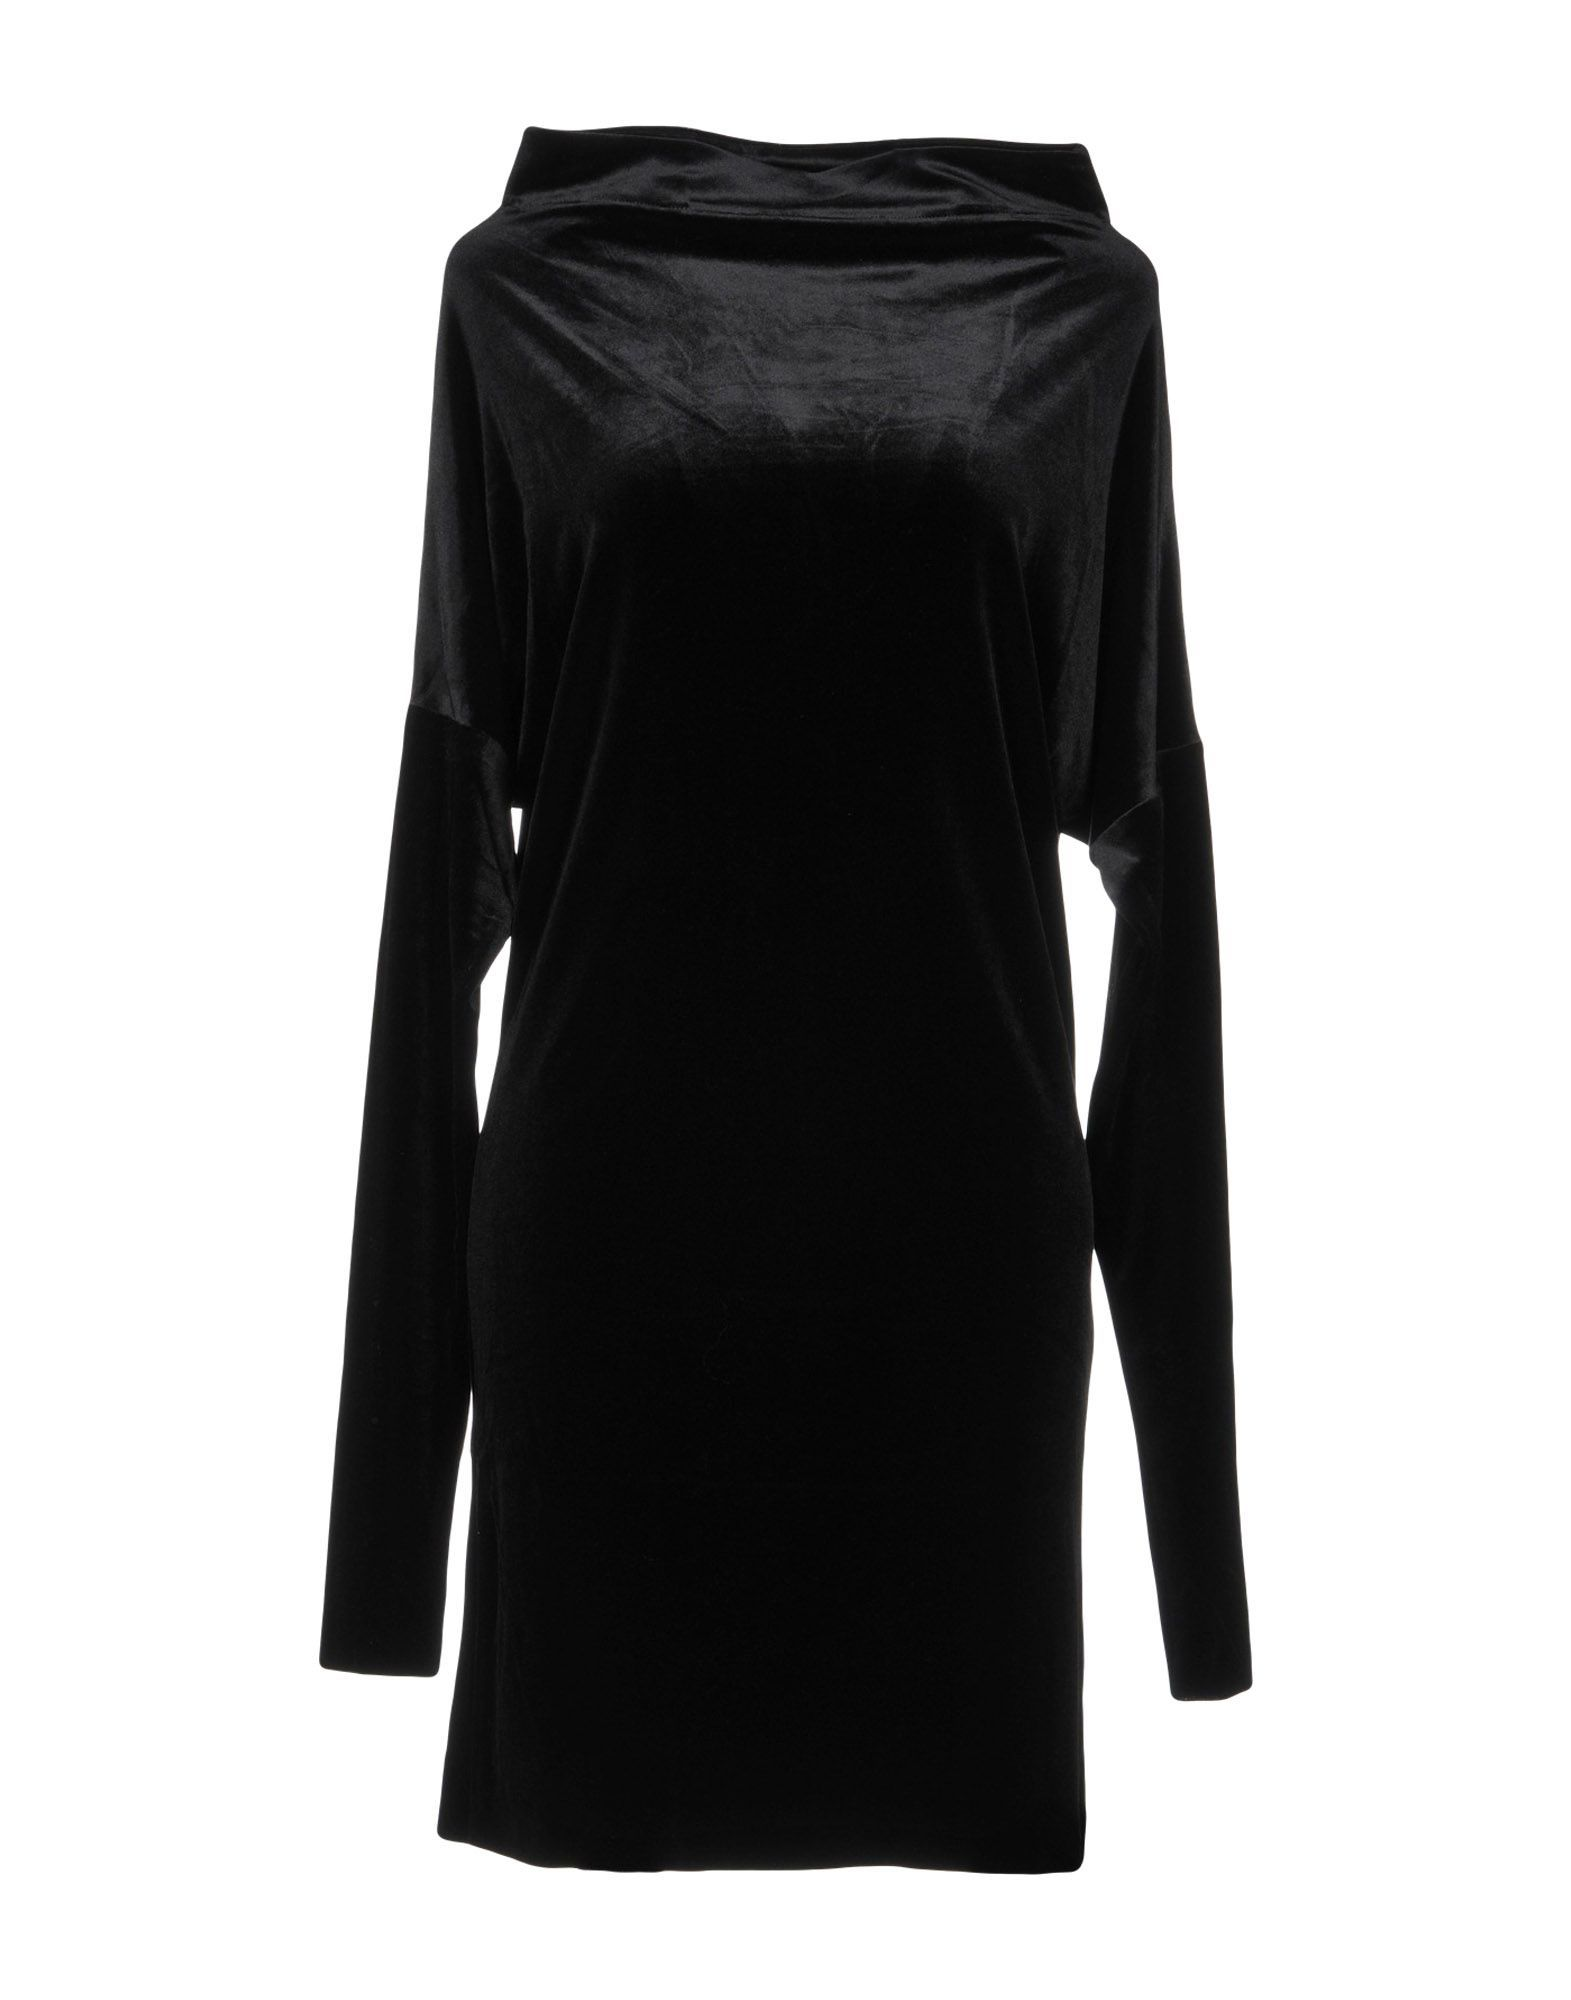 Norma Kamali Black Chenille Long Sleeve Dress